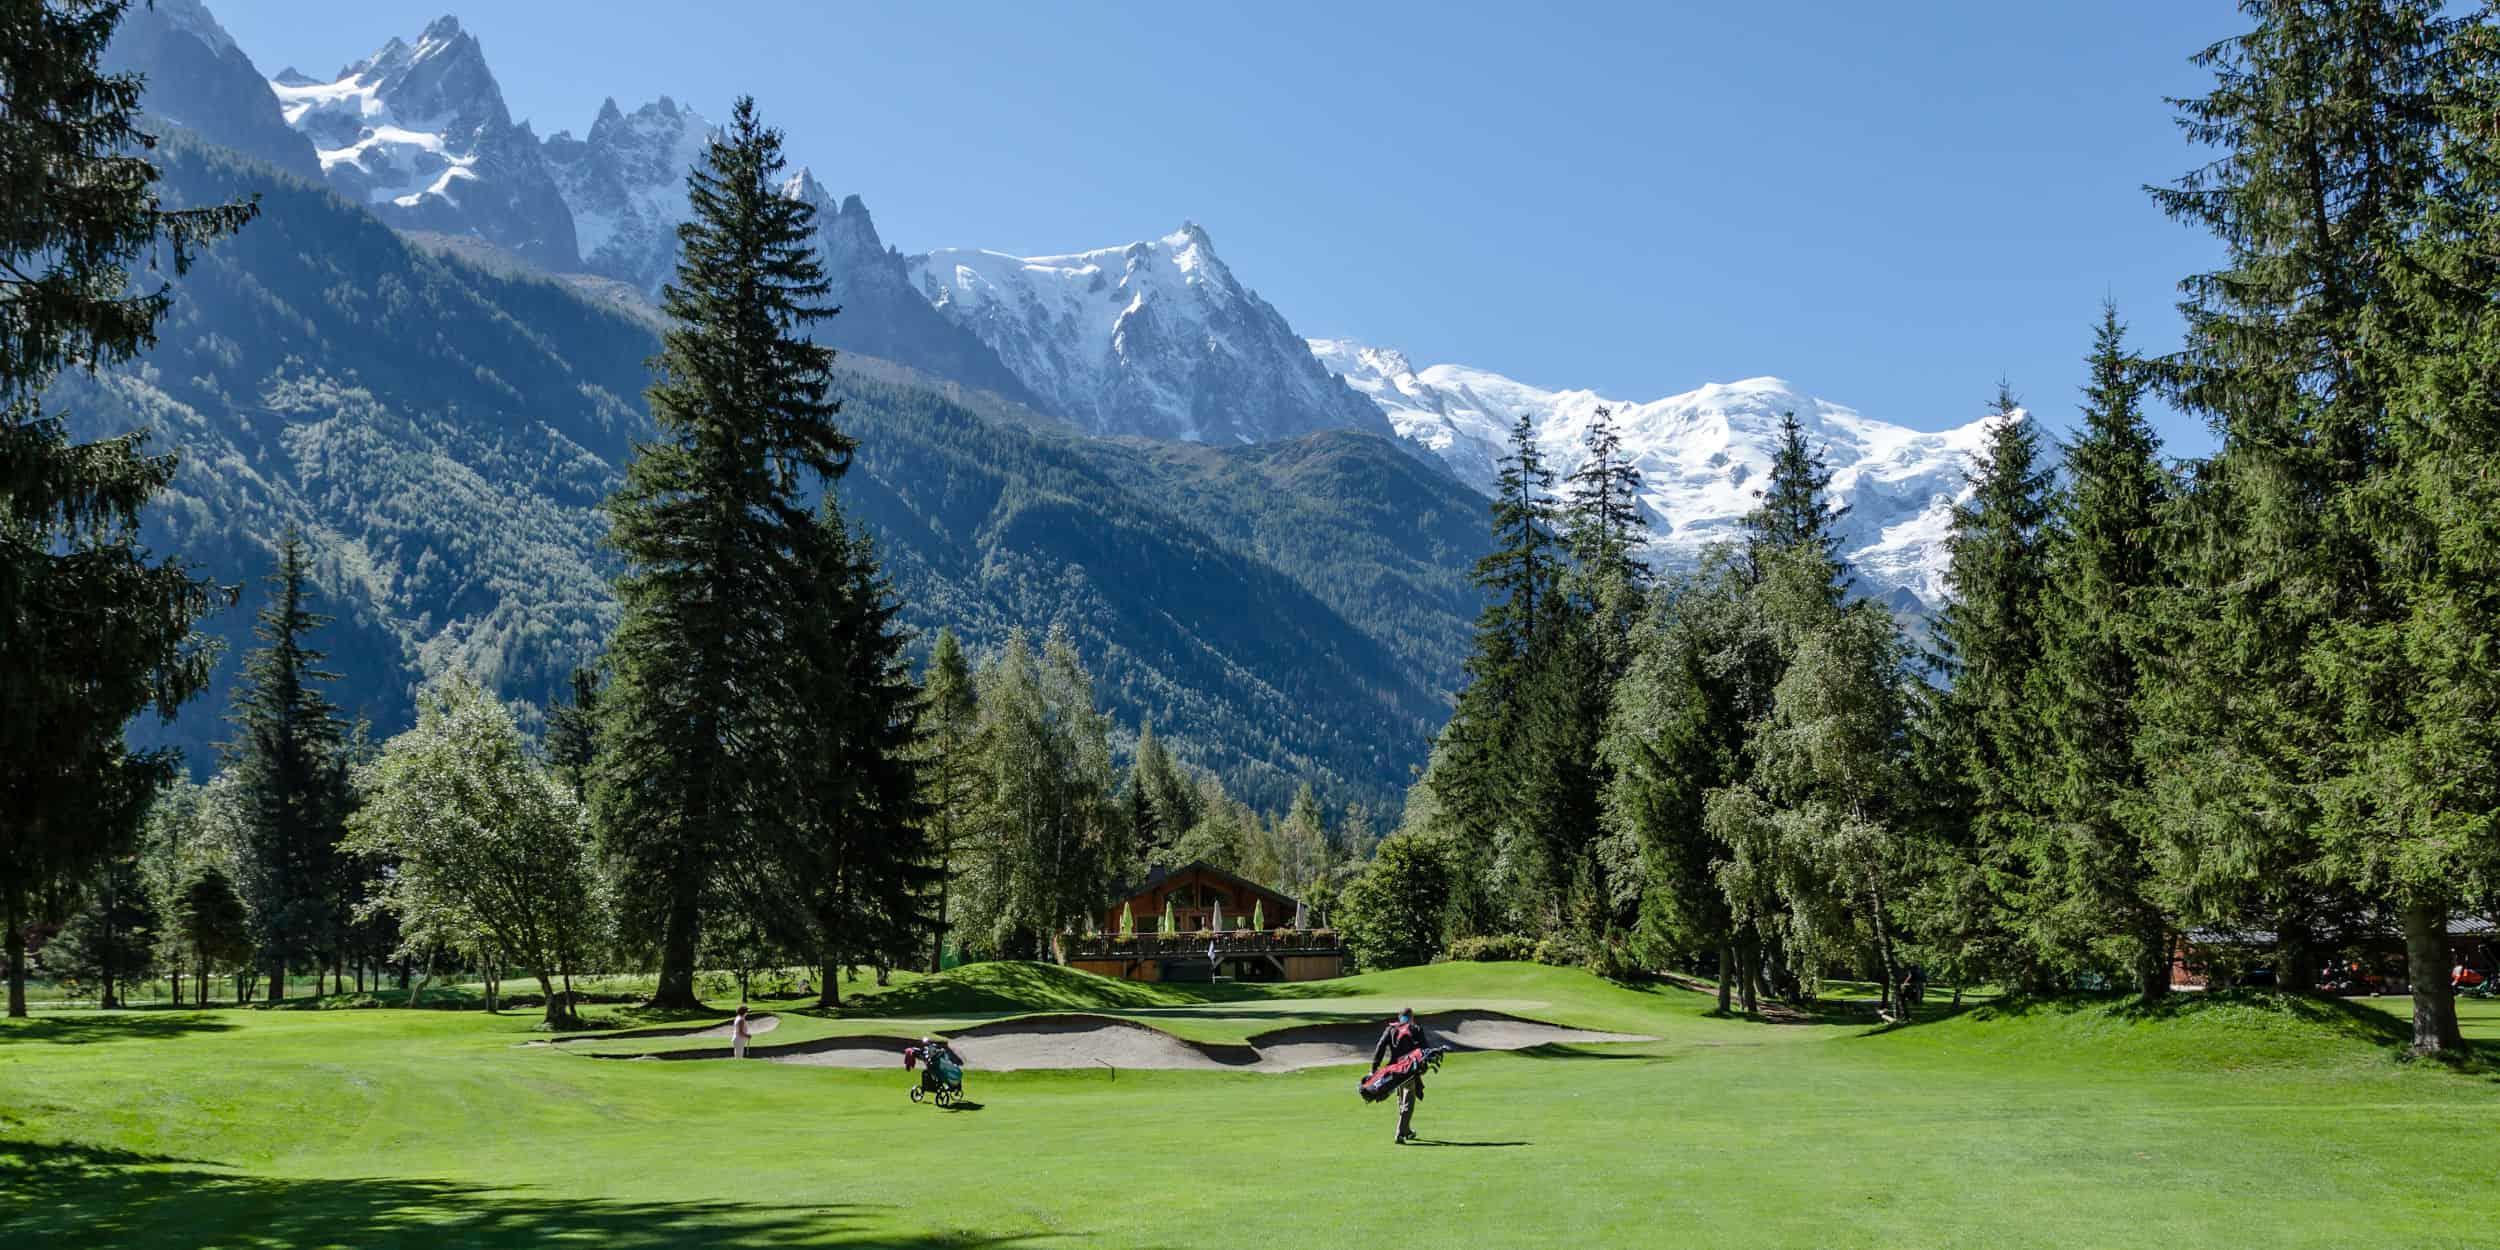 tournoi-barnes-golf-club-trophee-barnes-14-juillet-2019